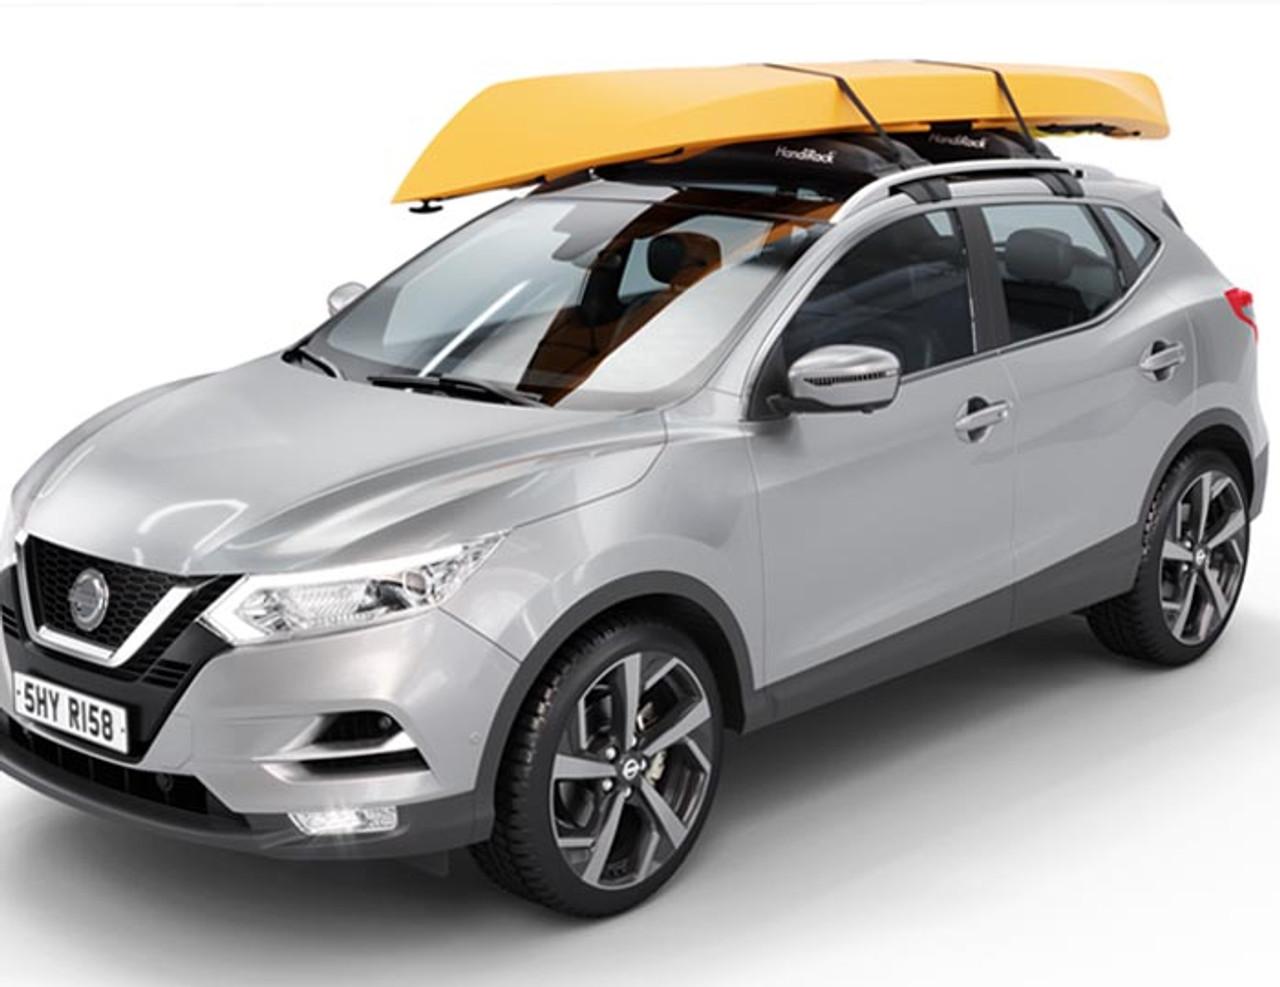 HandiRack Roof Rack - Inflatable Crossbars - Bare Roof - Nylon (MPG452)